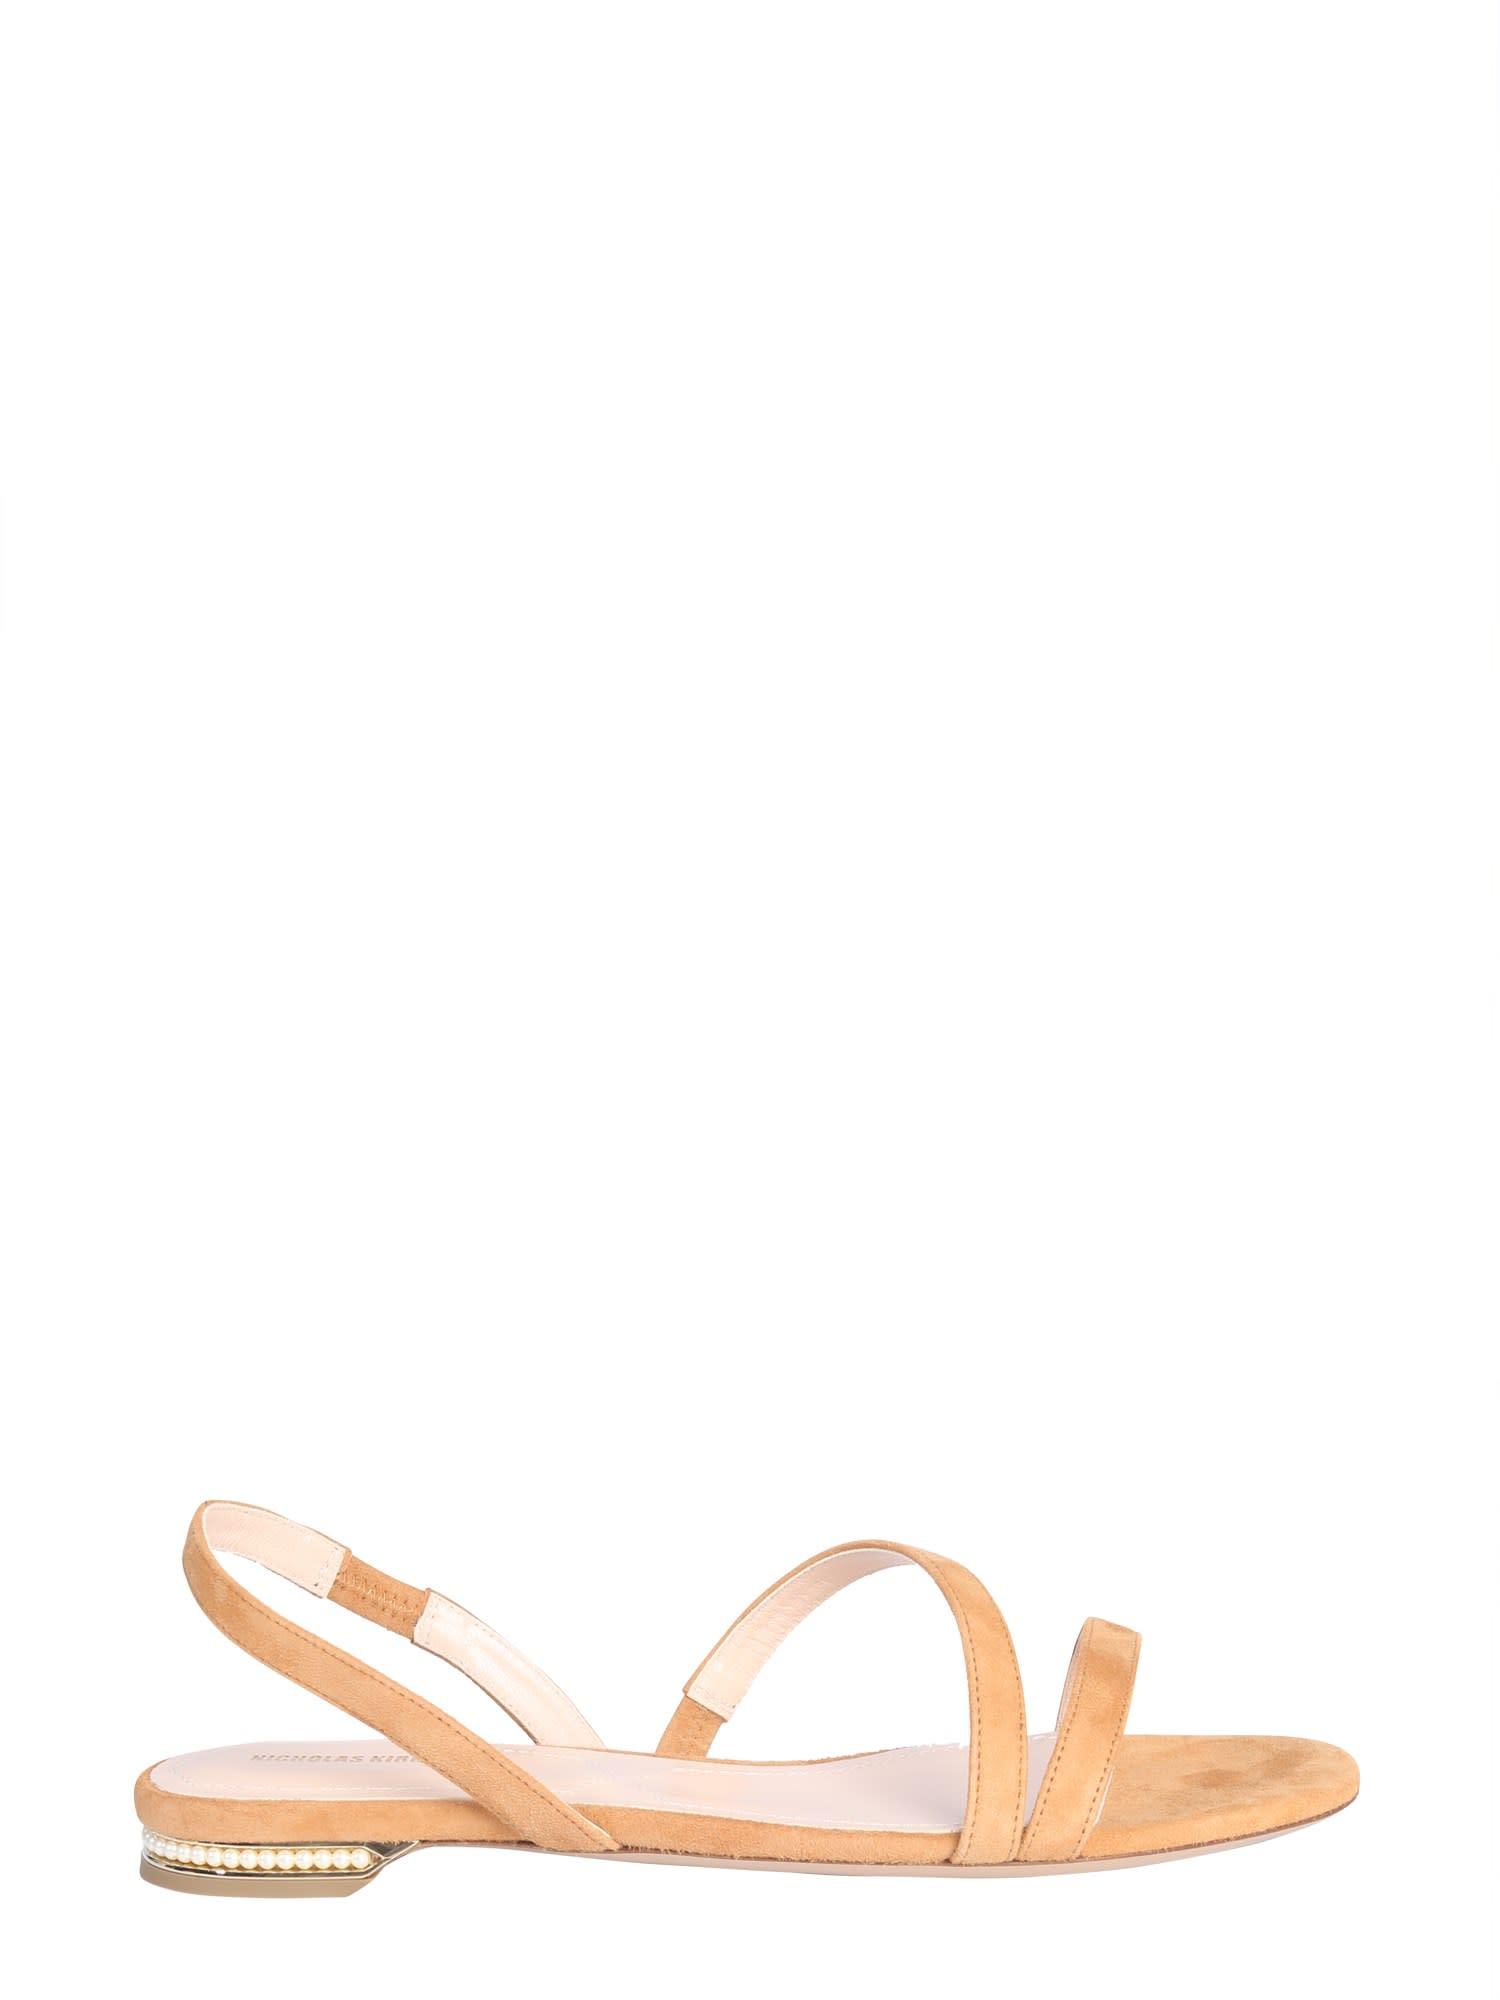 Buy Nicholas Kirkwood Casati Sandals online, shop Nicholas Kirkwood shoes with free shipping